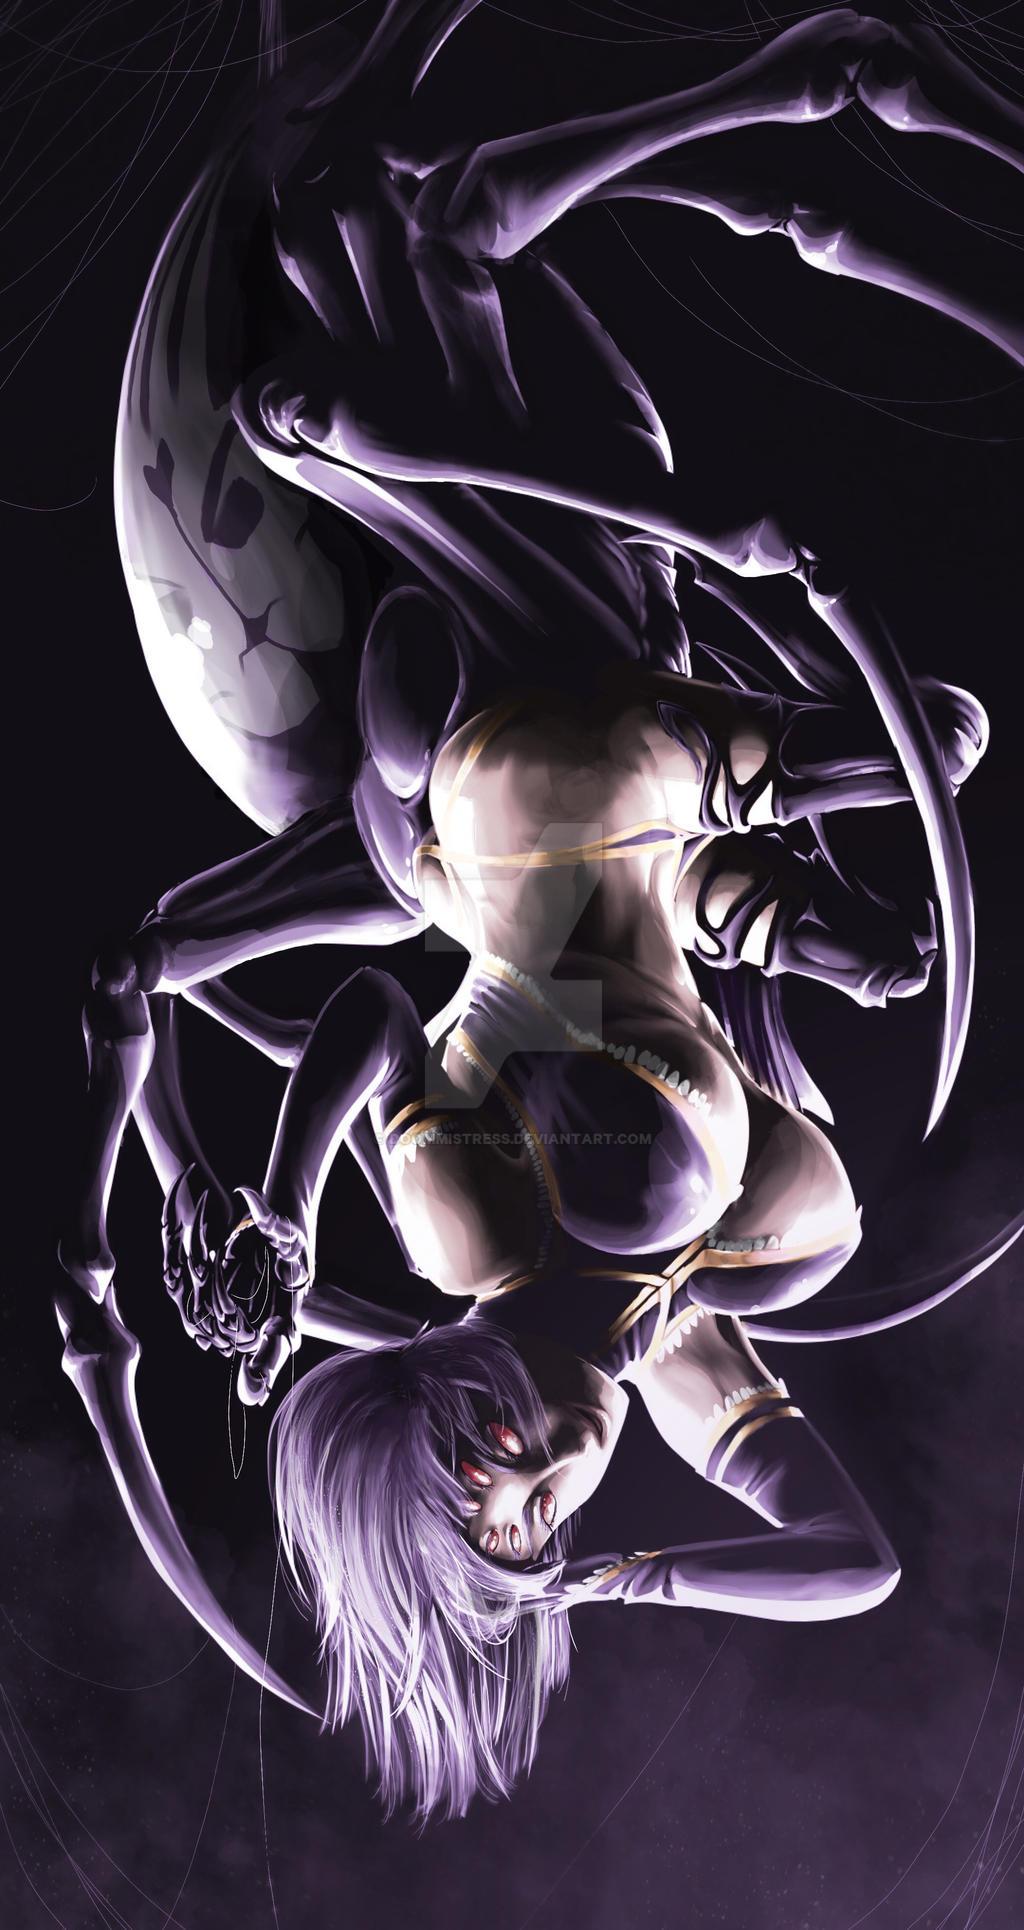 Rachnera Arachnera by DoomMistress